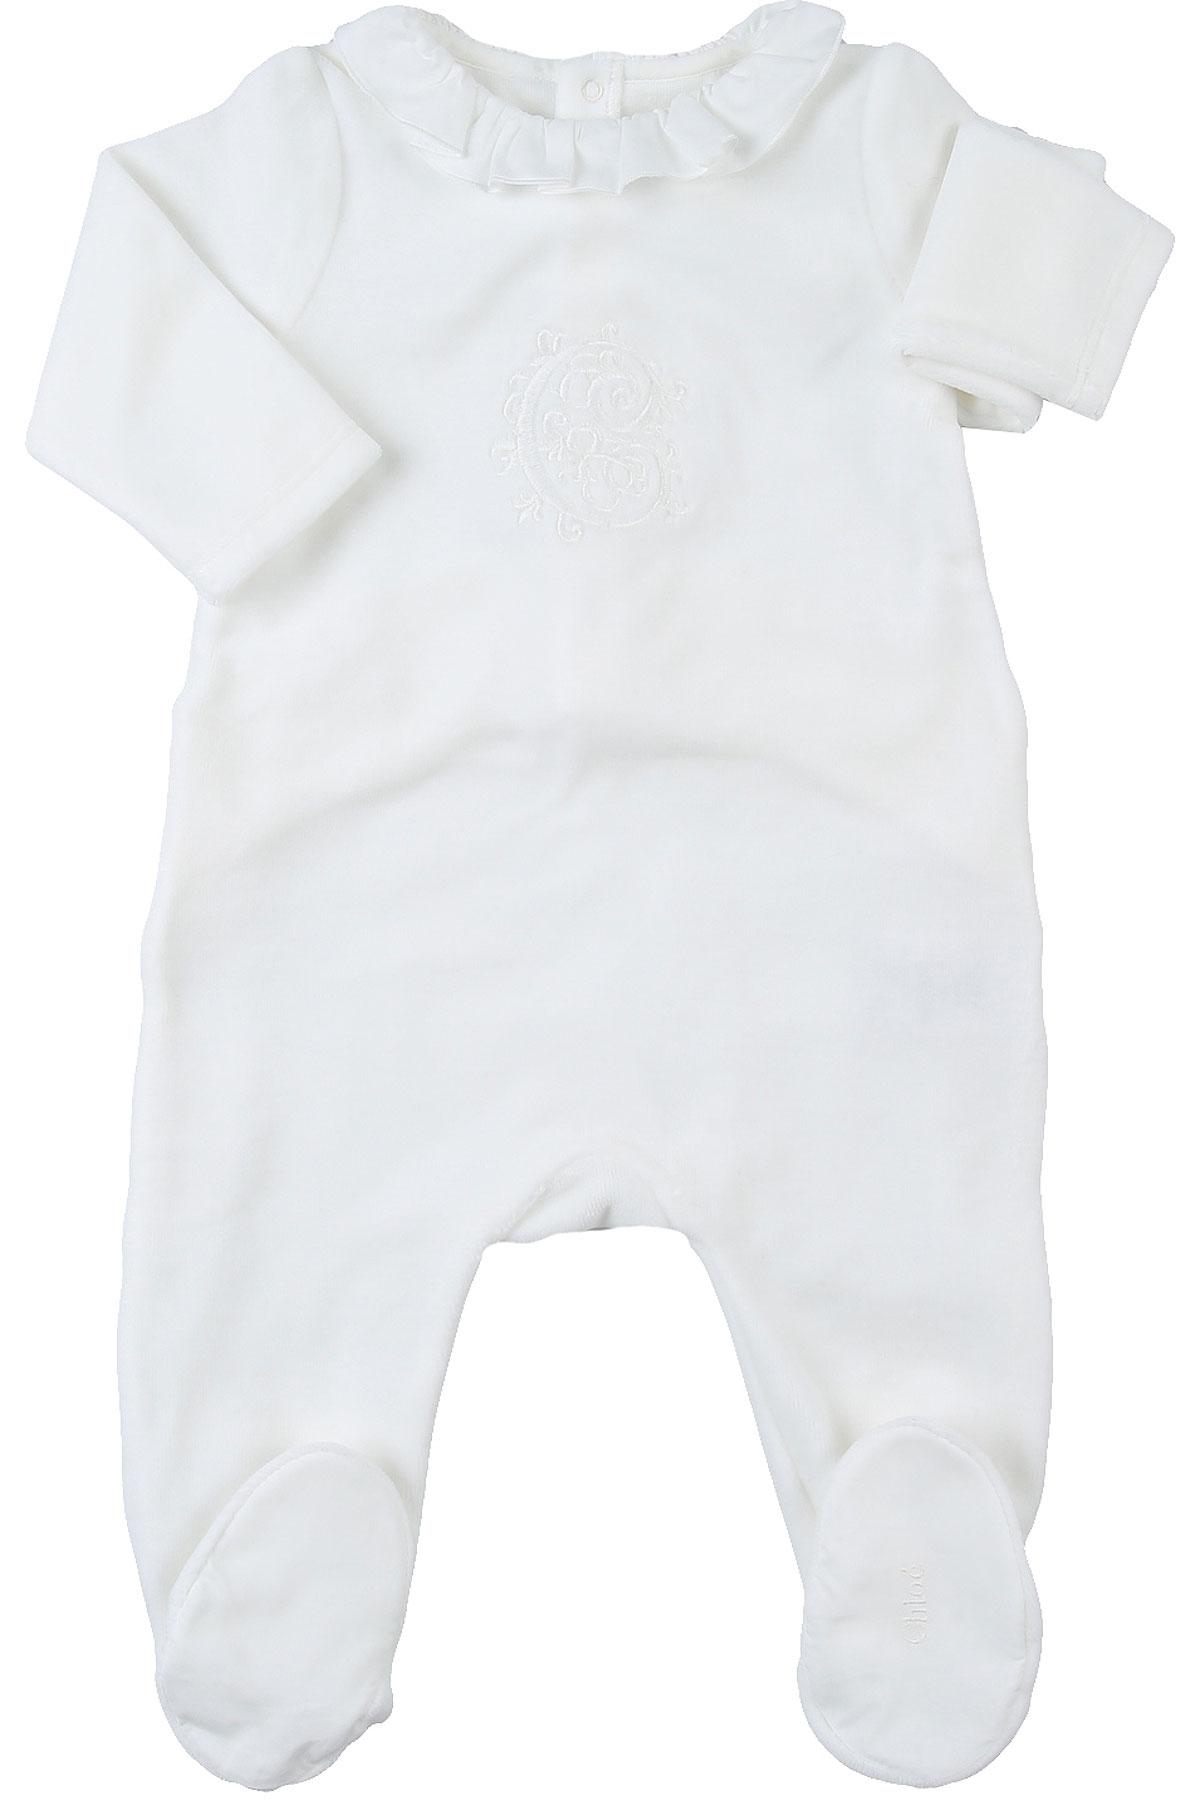 Chloe Baby Bodysuits & Onesies for Girls On Sale, White, Cotton, 2019, 1M 3M 6M 9M